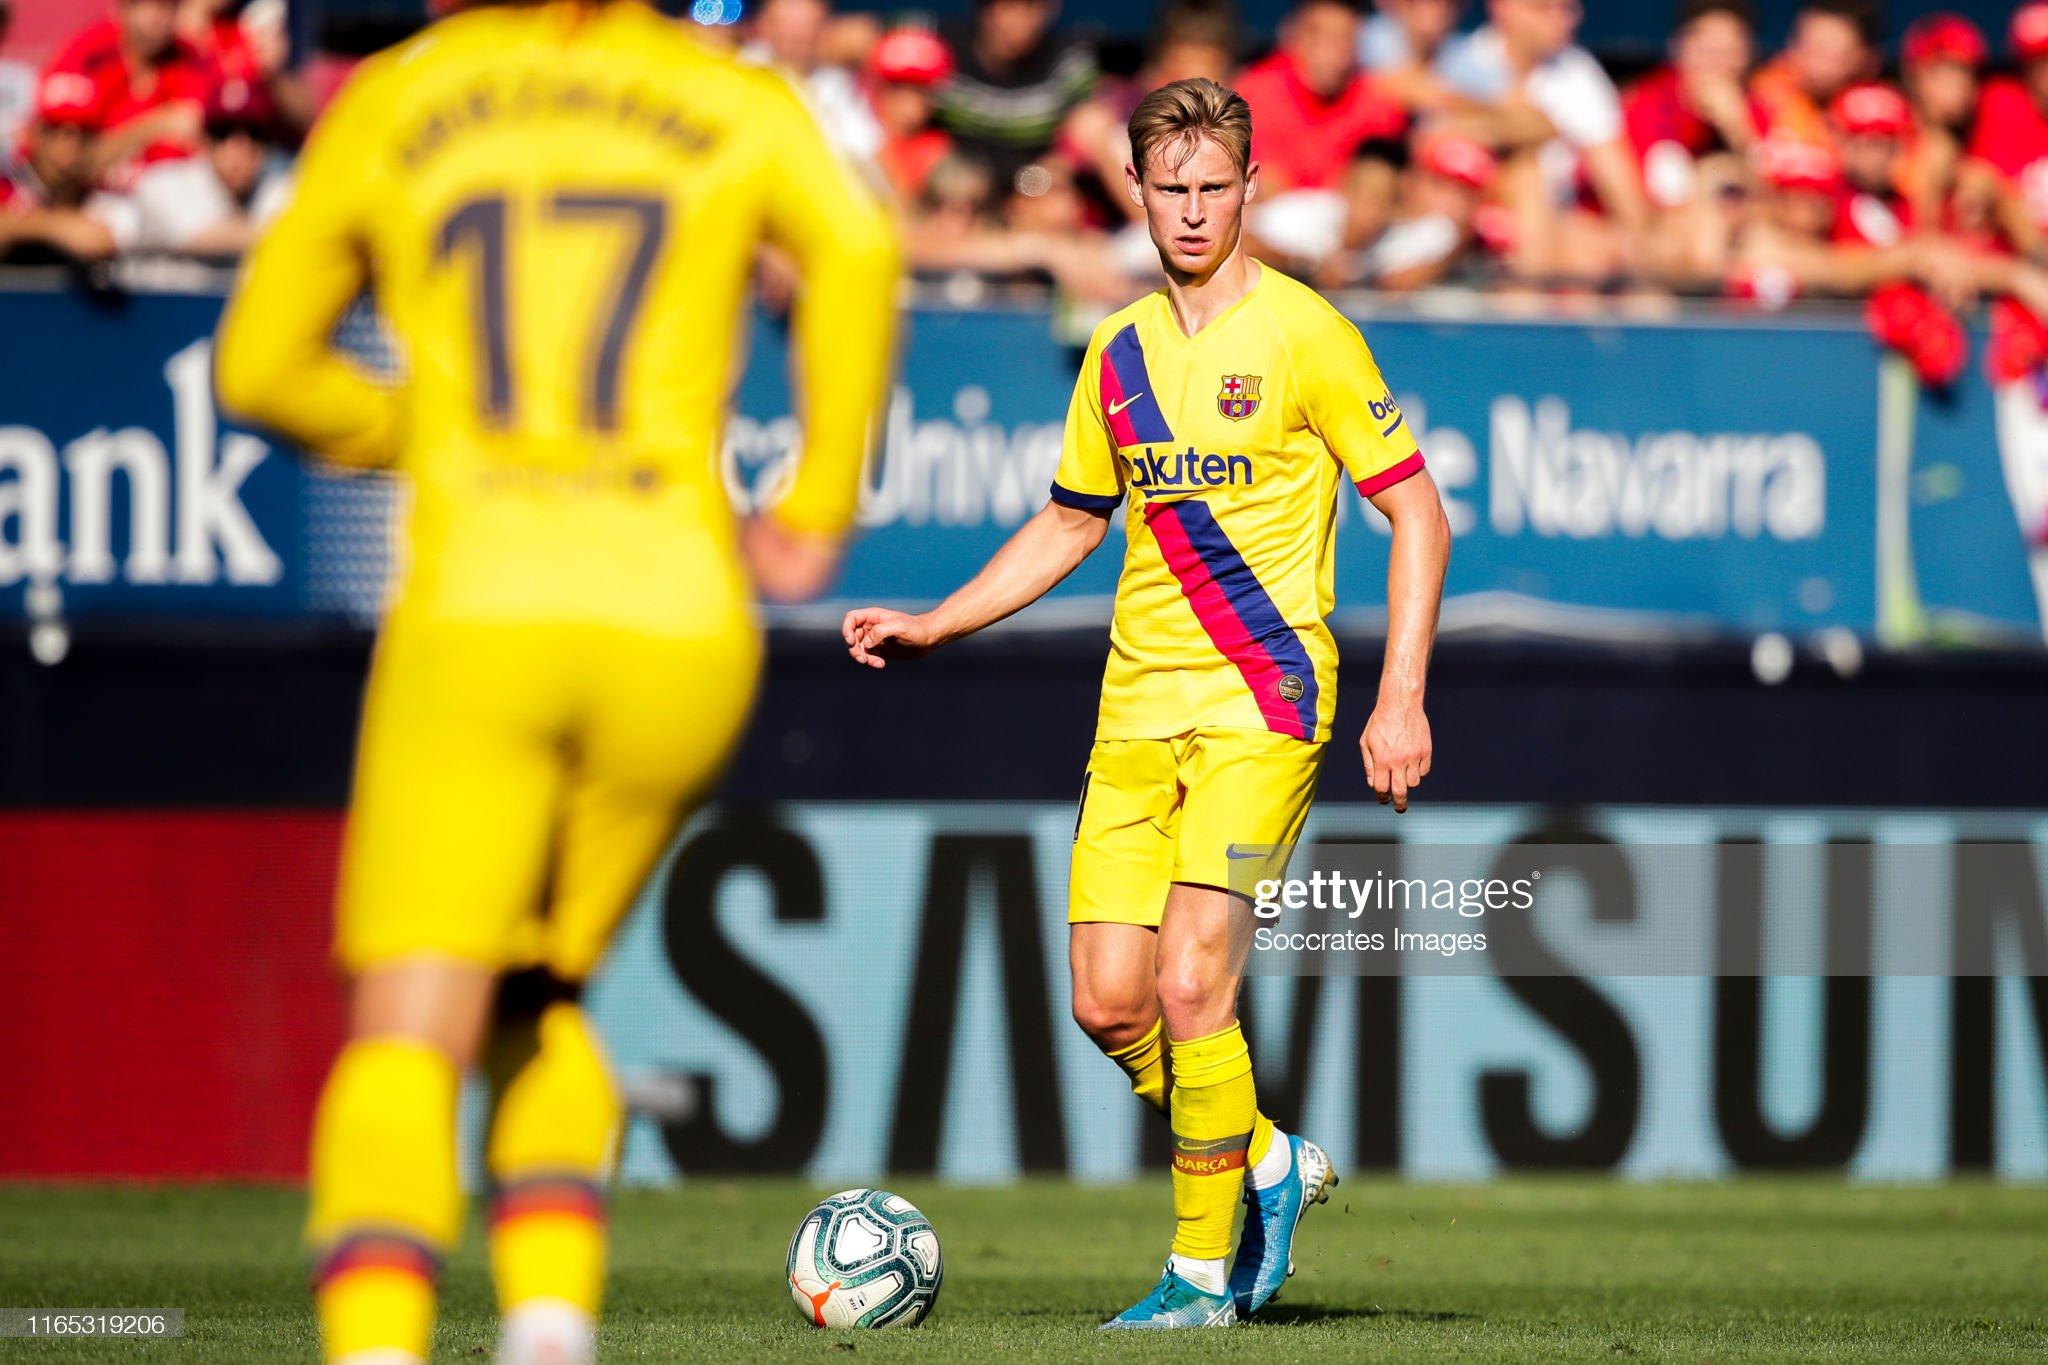 صور مباراة : أوساسونا - برشلونة 2-2 ( 31-08-2019 )  Frenkie-de-jong-of-fc-barcelona-during-the-la-liga-santander-match-picture-id1165319206?s=2048x2048